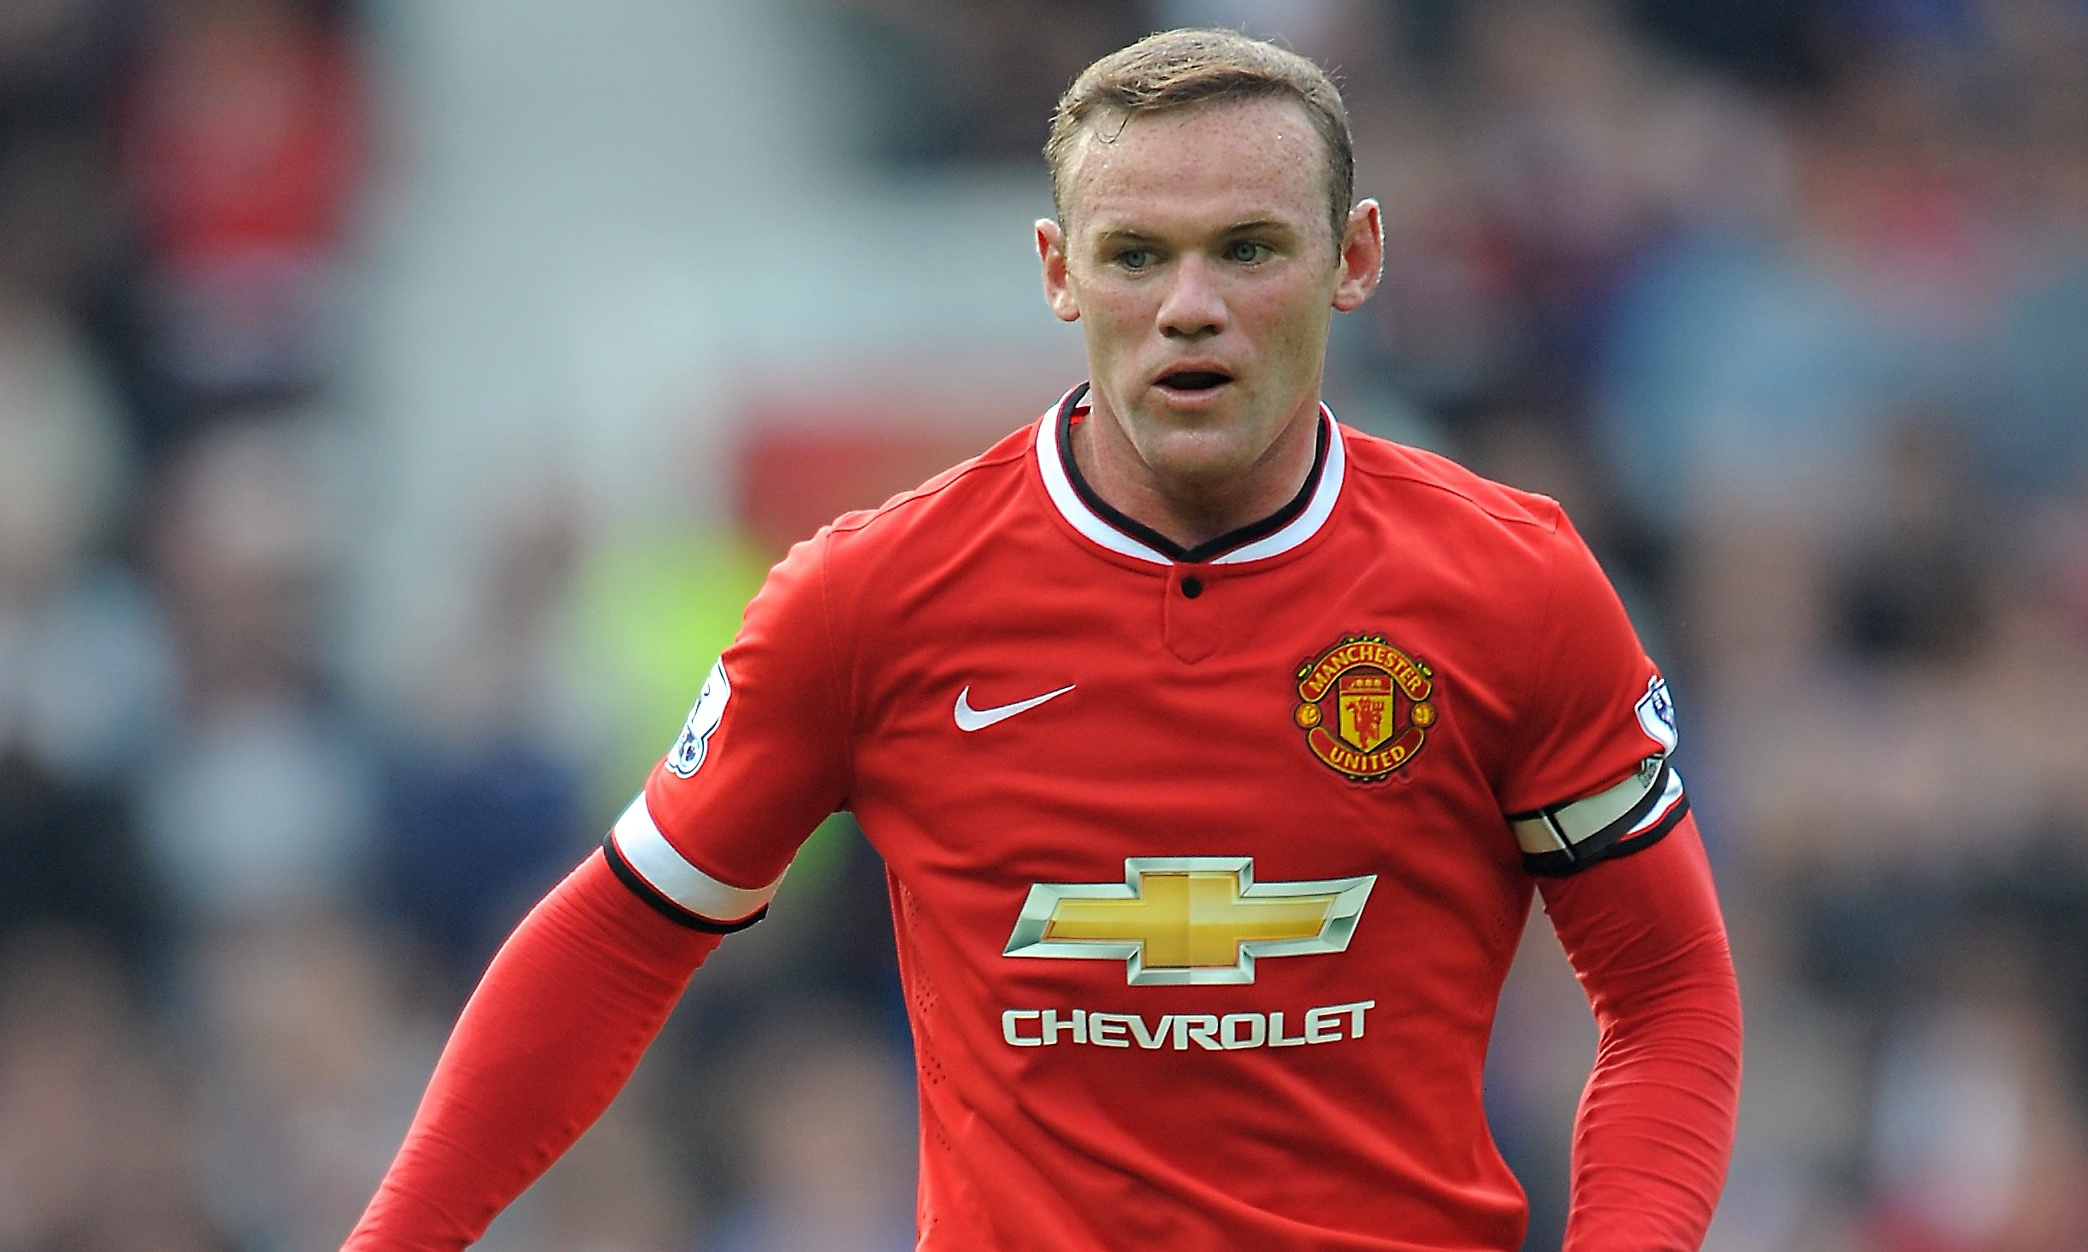 Wayne Rooney (Manchester United):